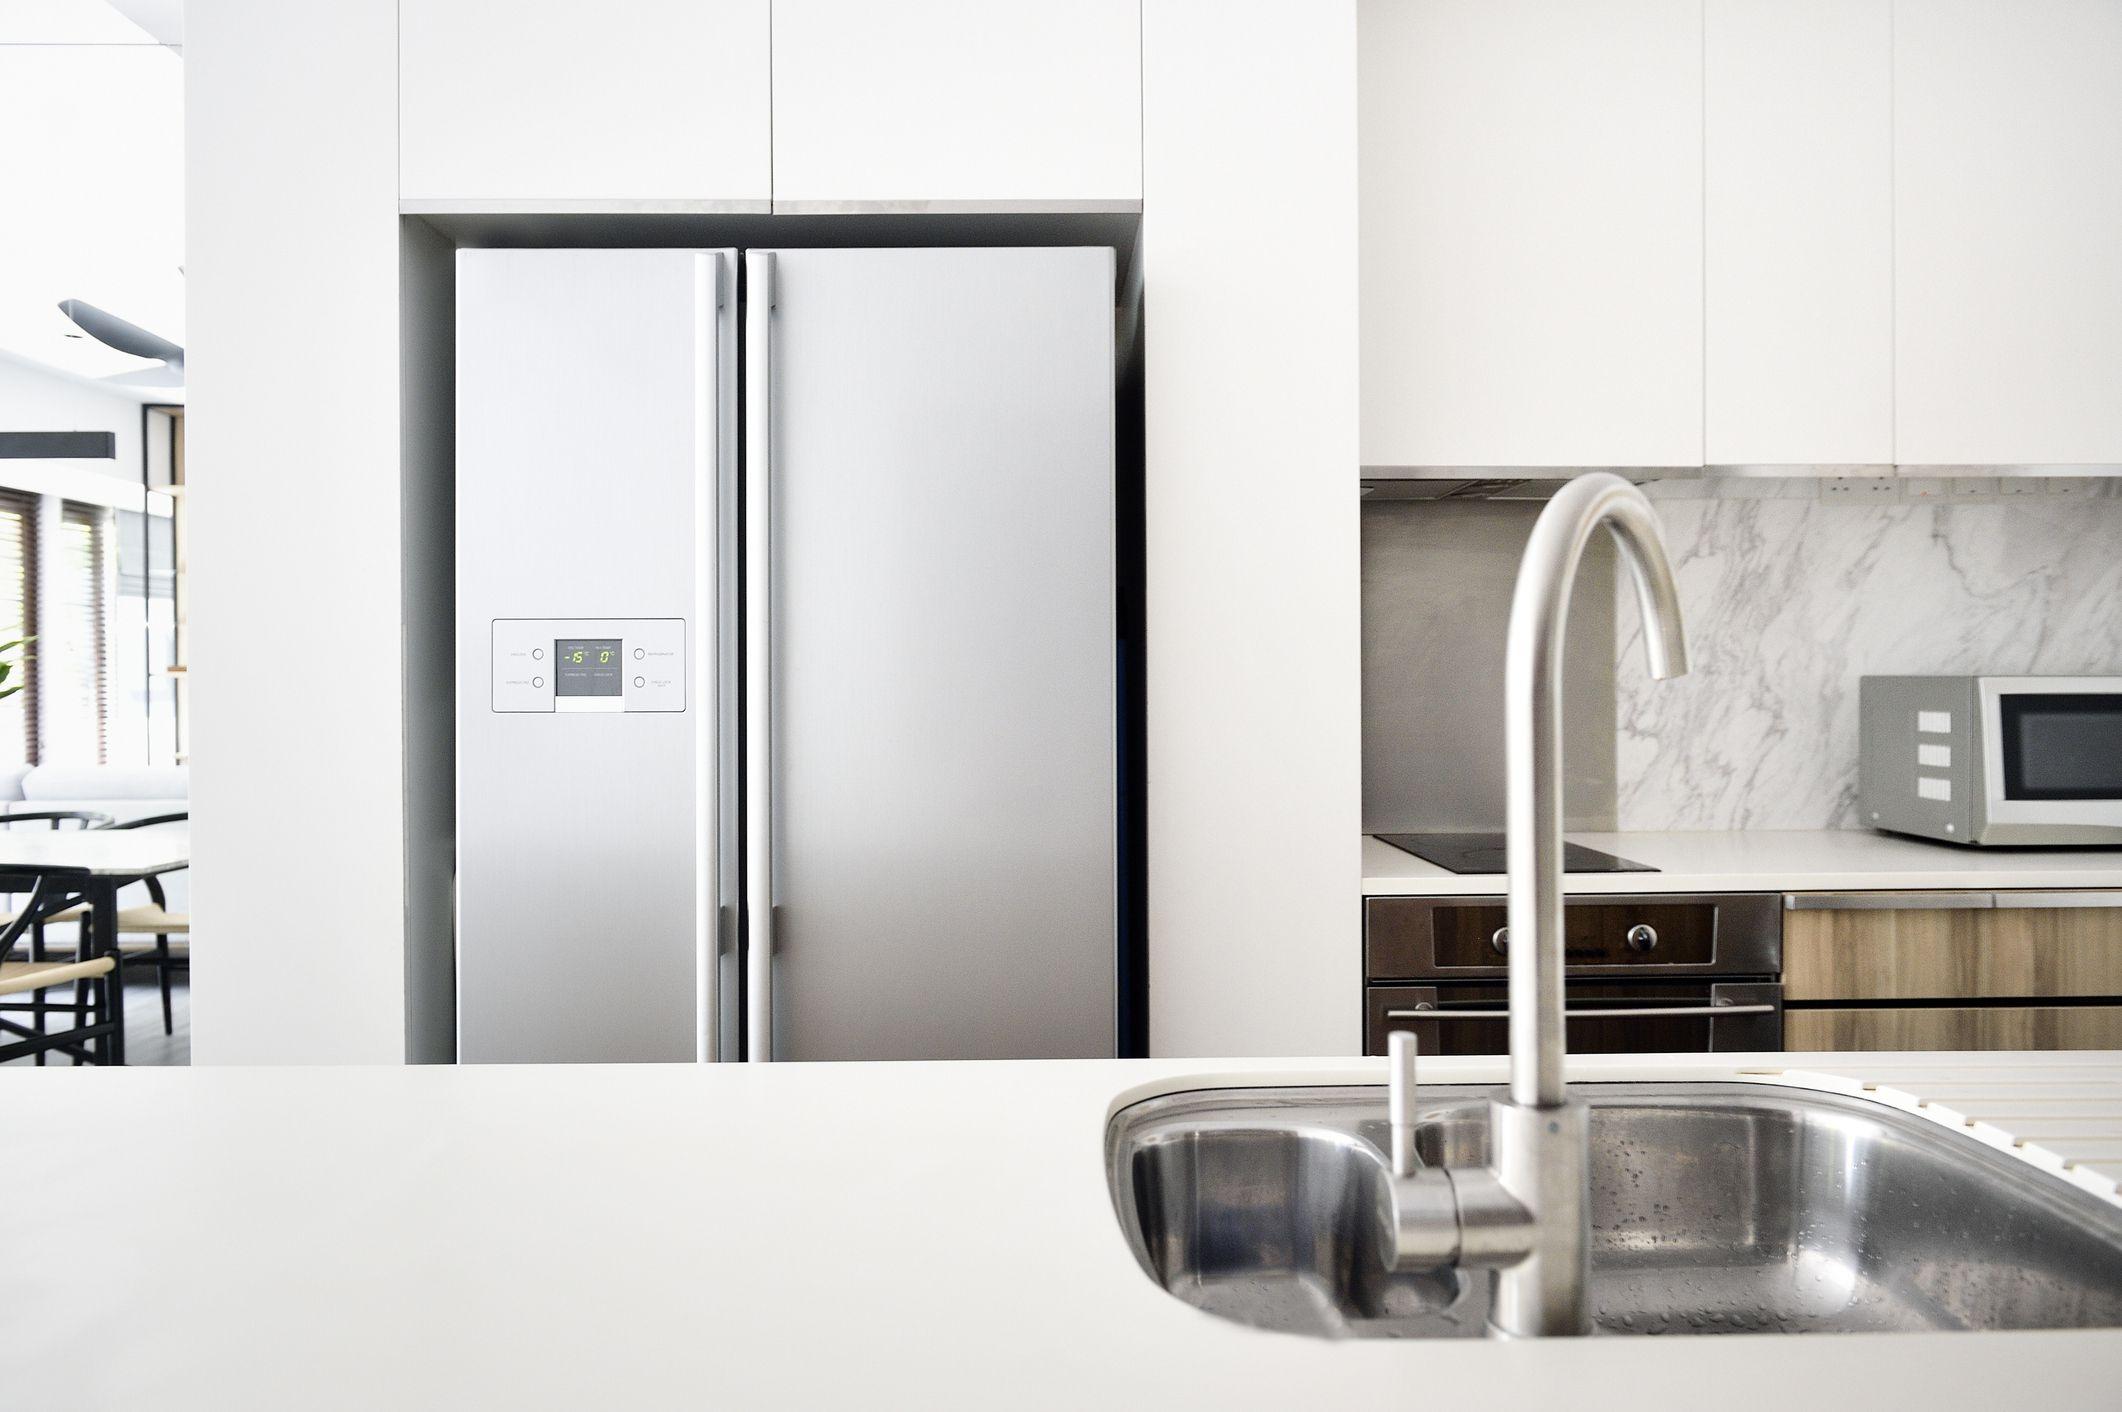 Best Side By Side Refrigerators Of 2020